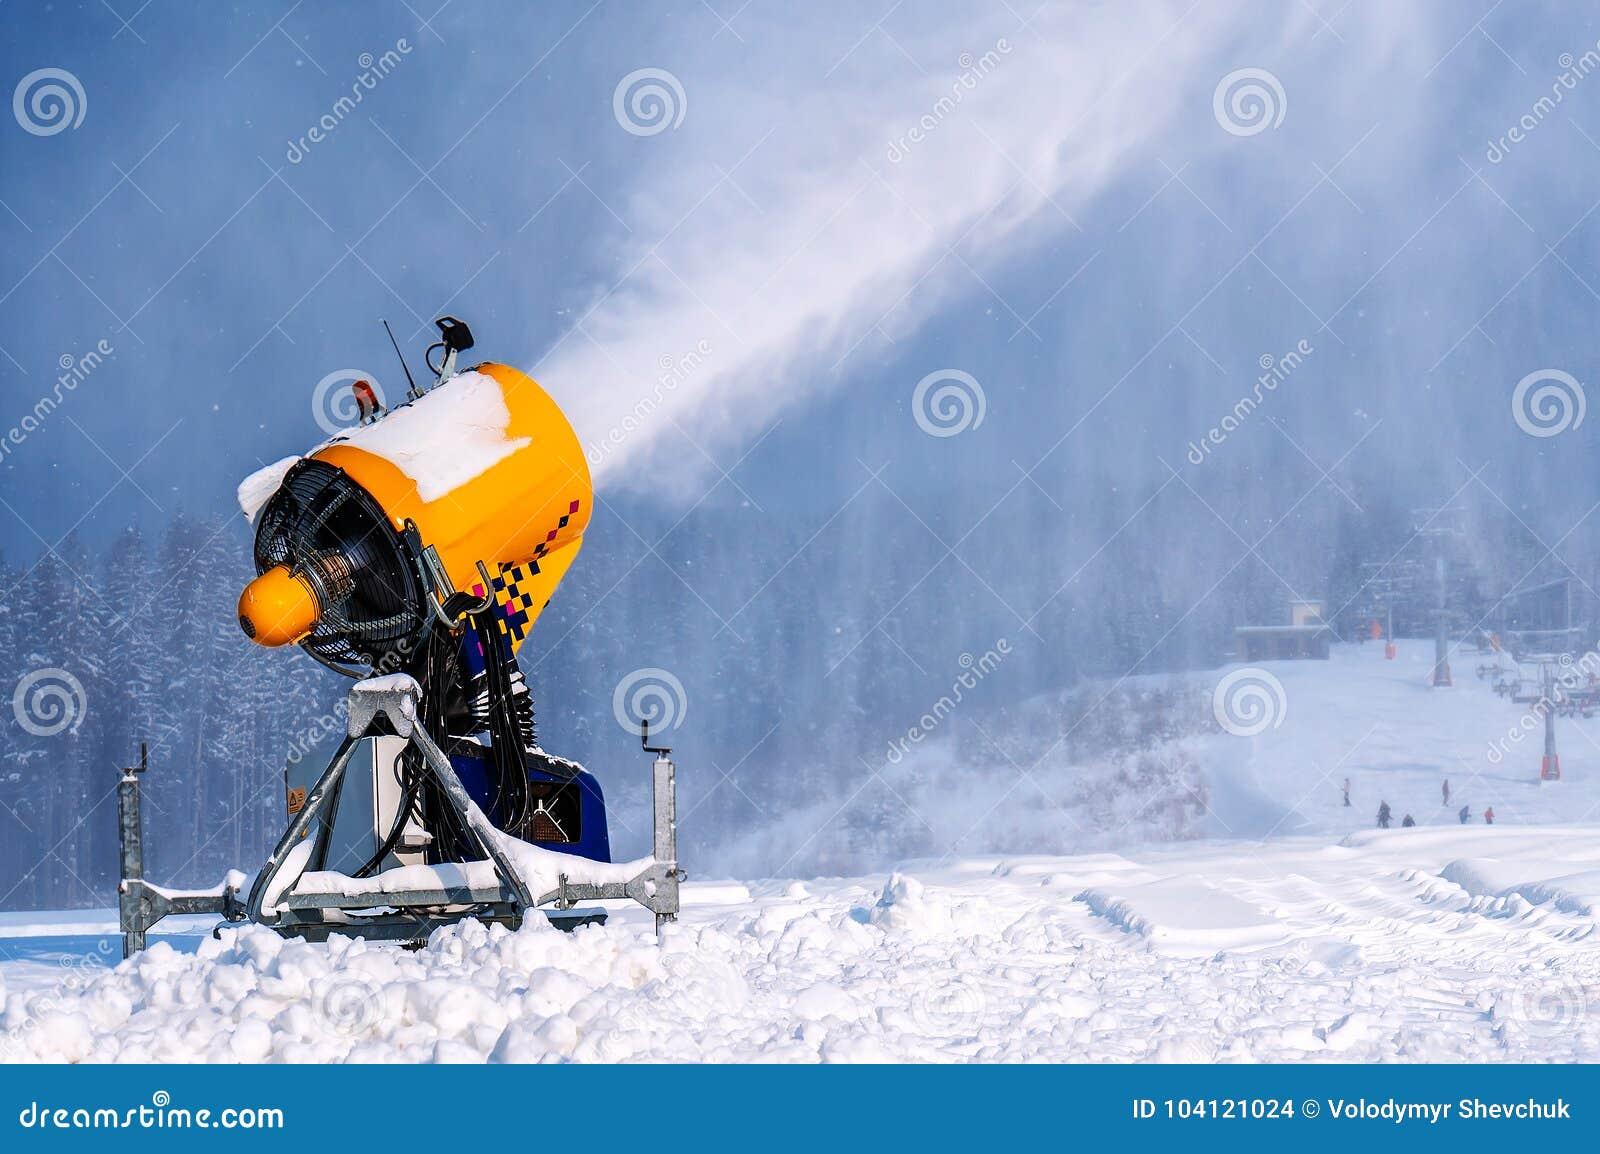 snow gun, ski resort stock photo. image of activity - 104121024